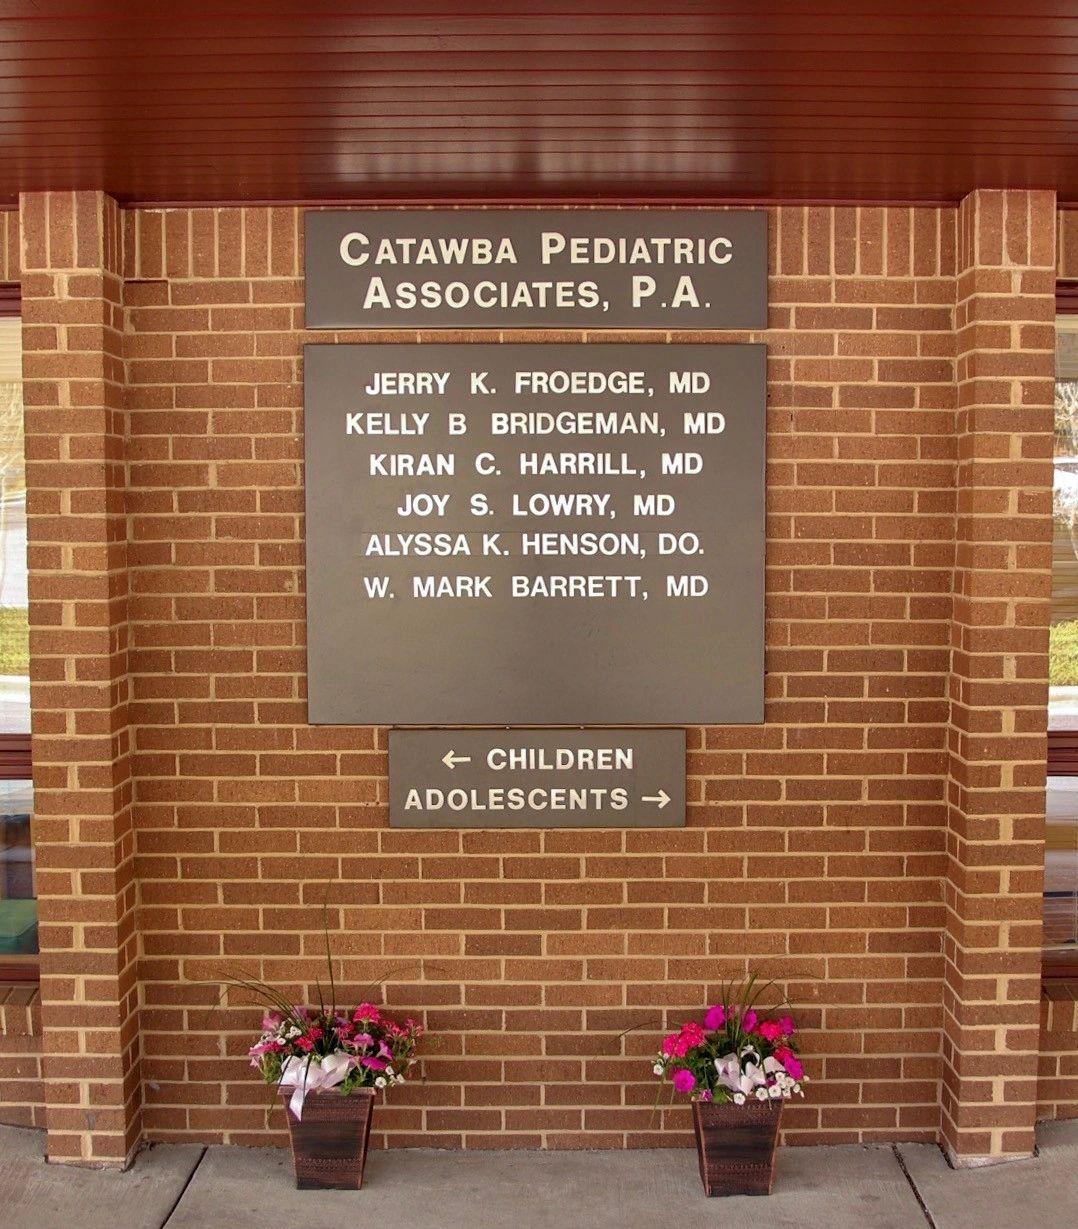 Staff | Catawba Pediatric Associates, PA